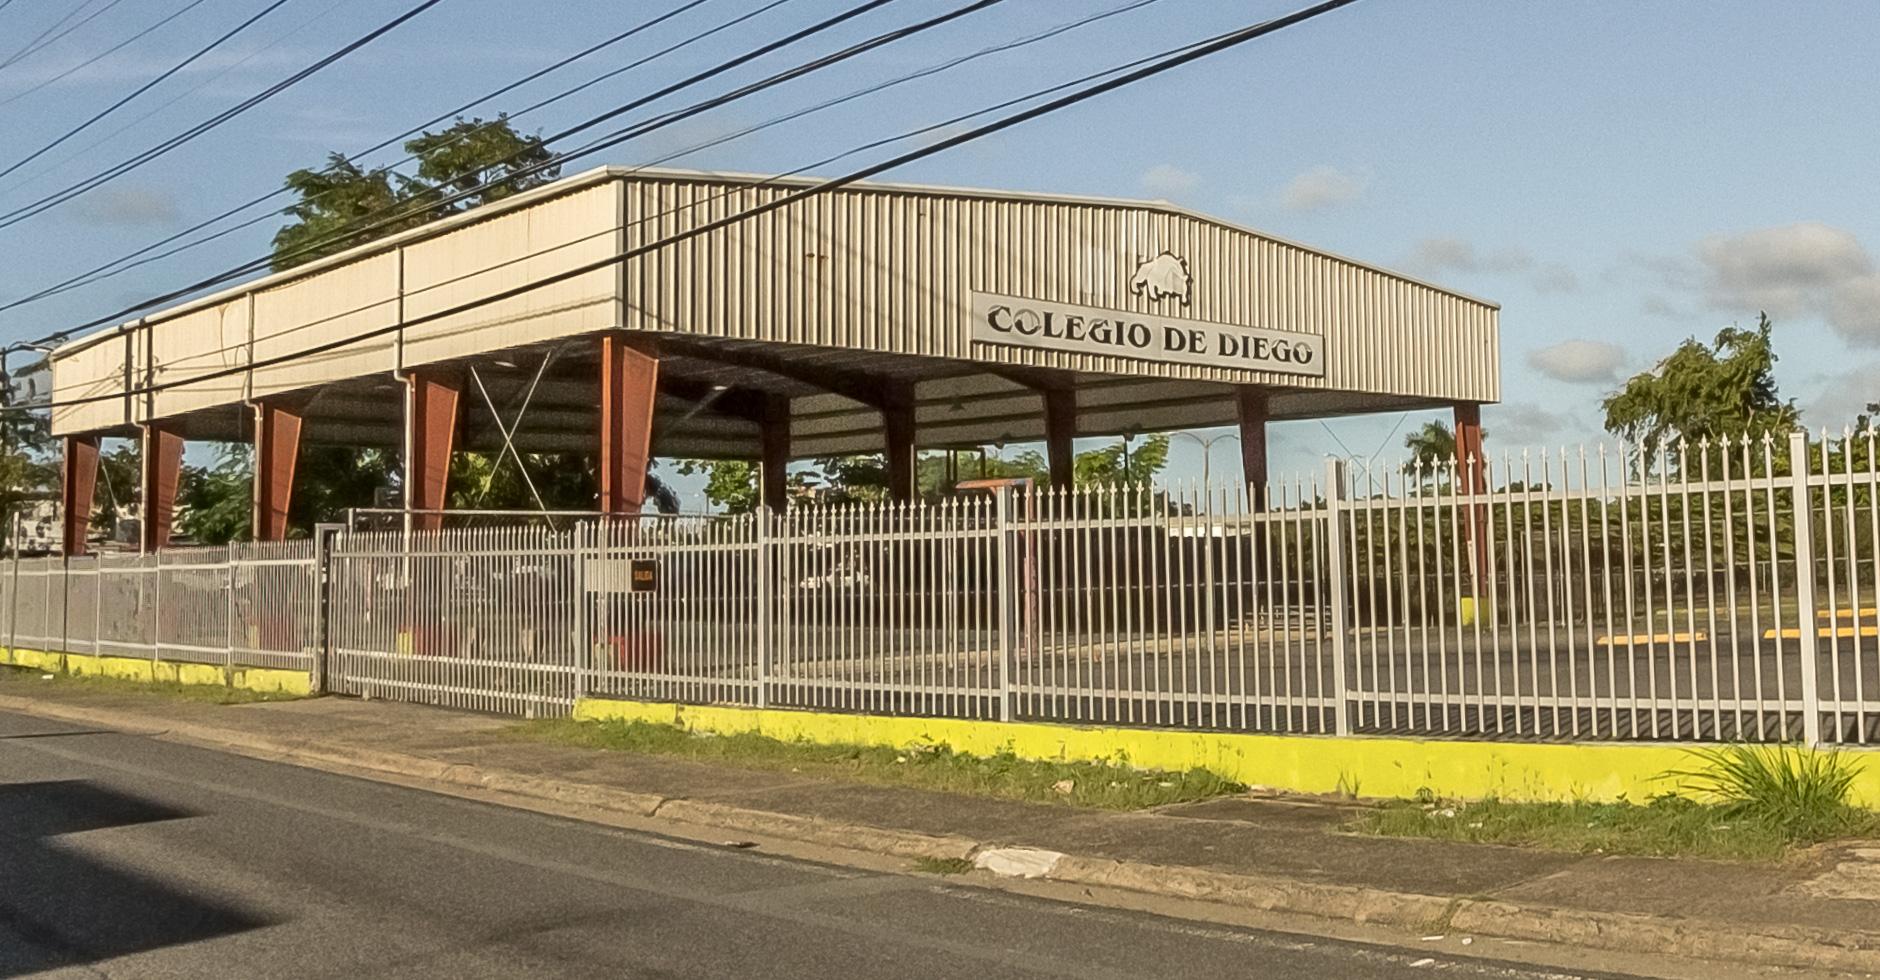 Colegio De Diego